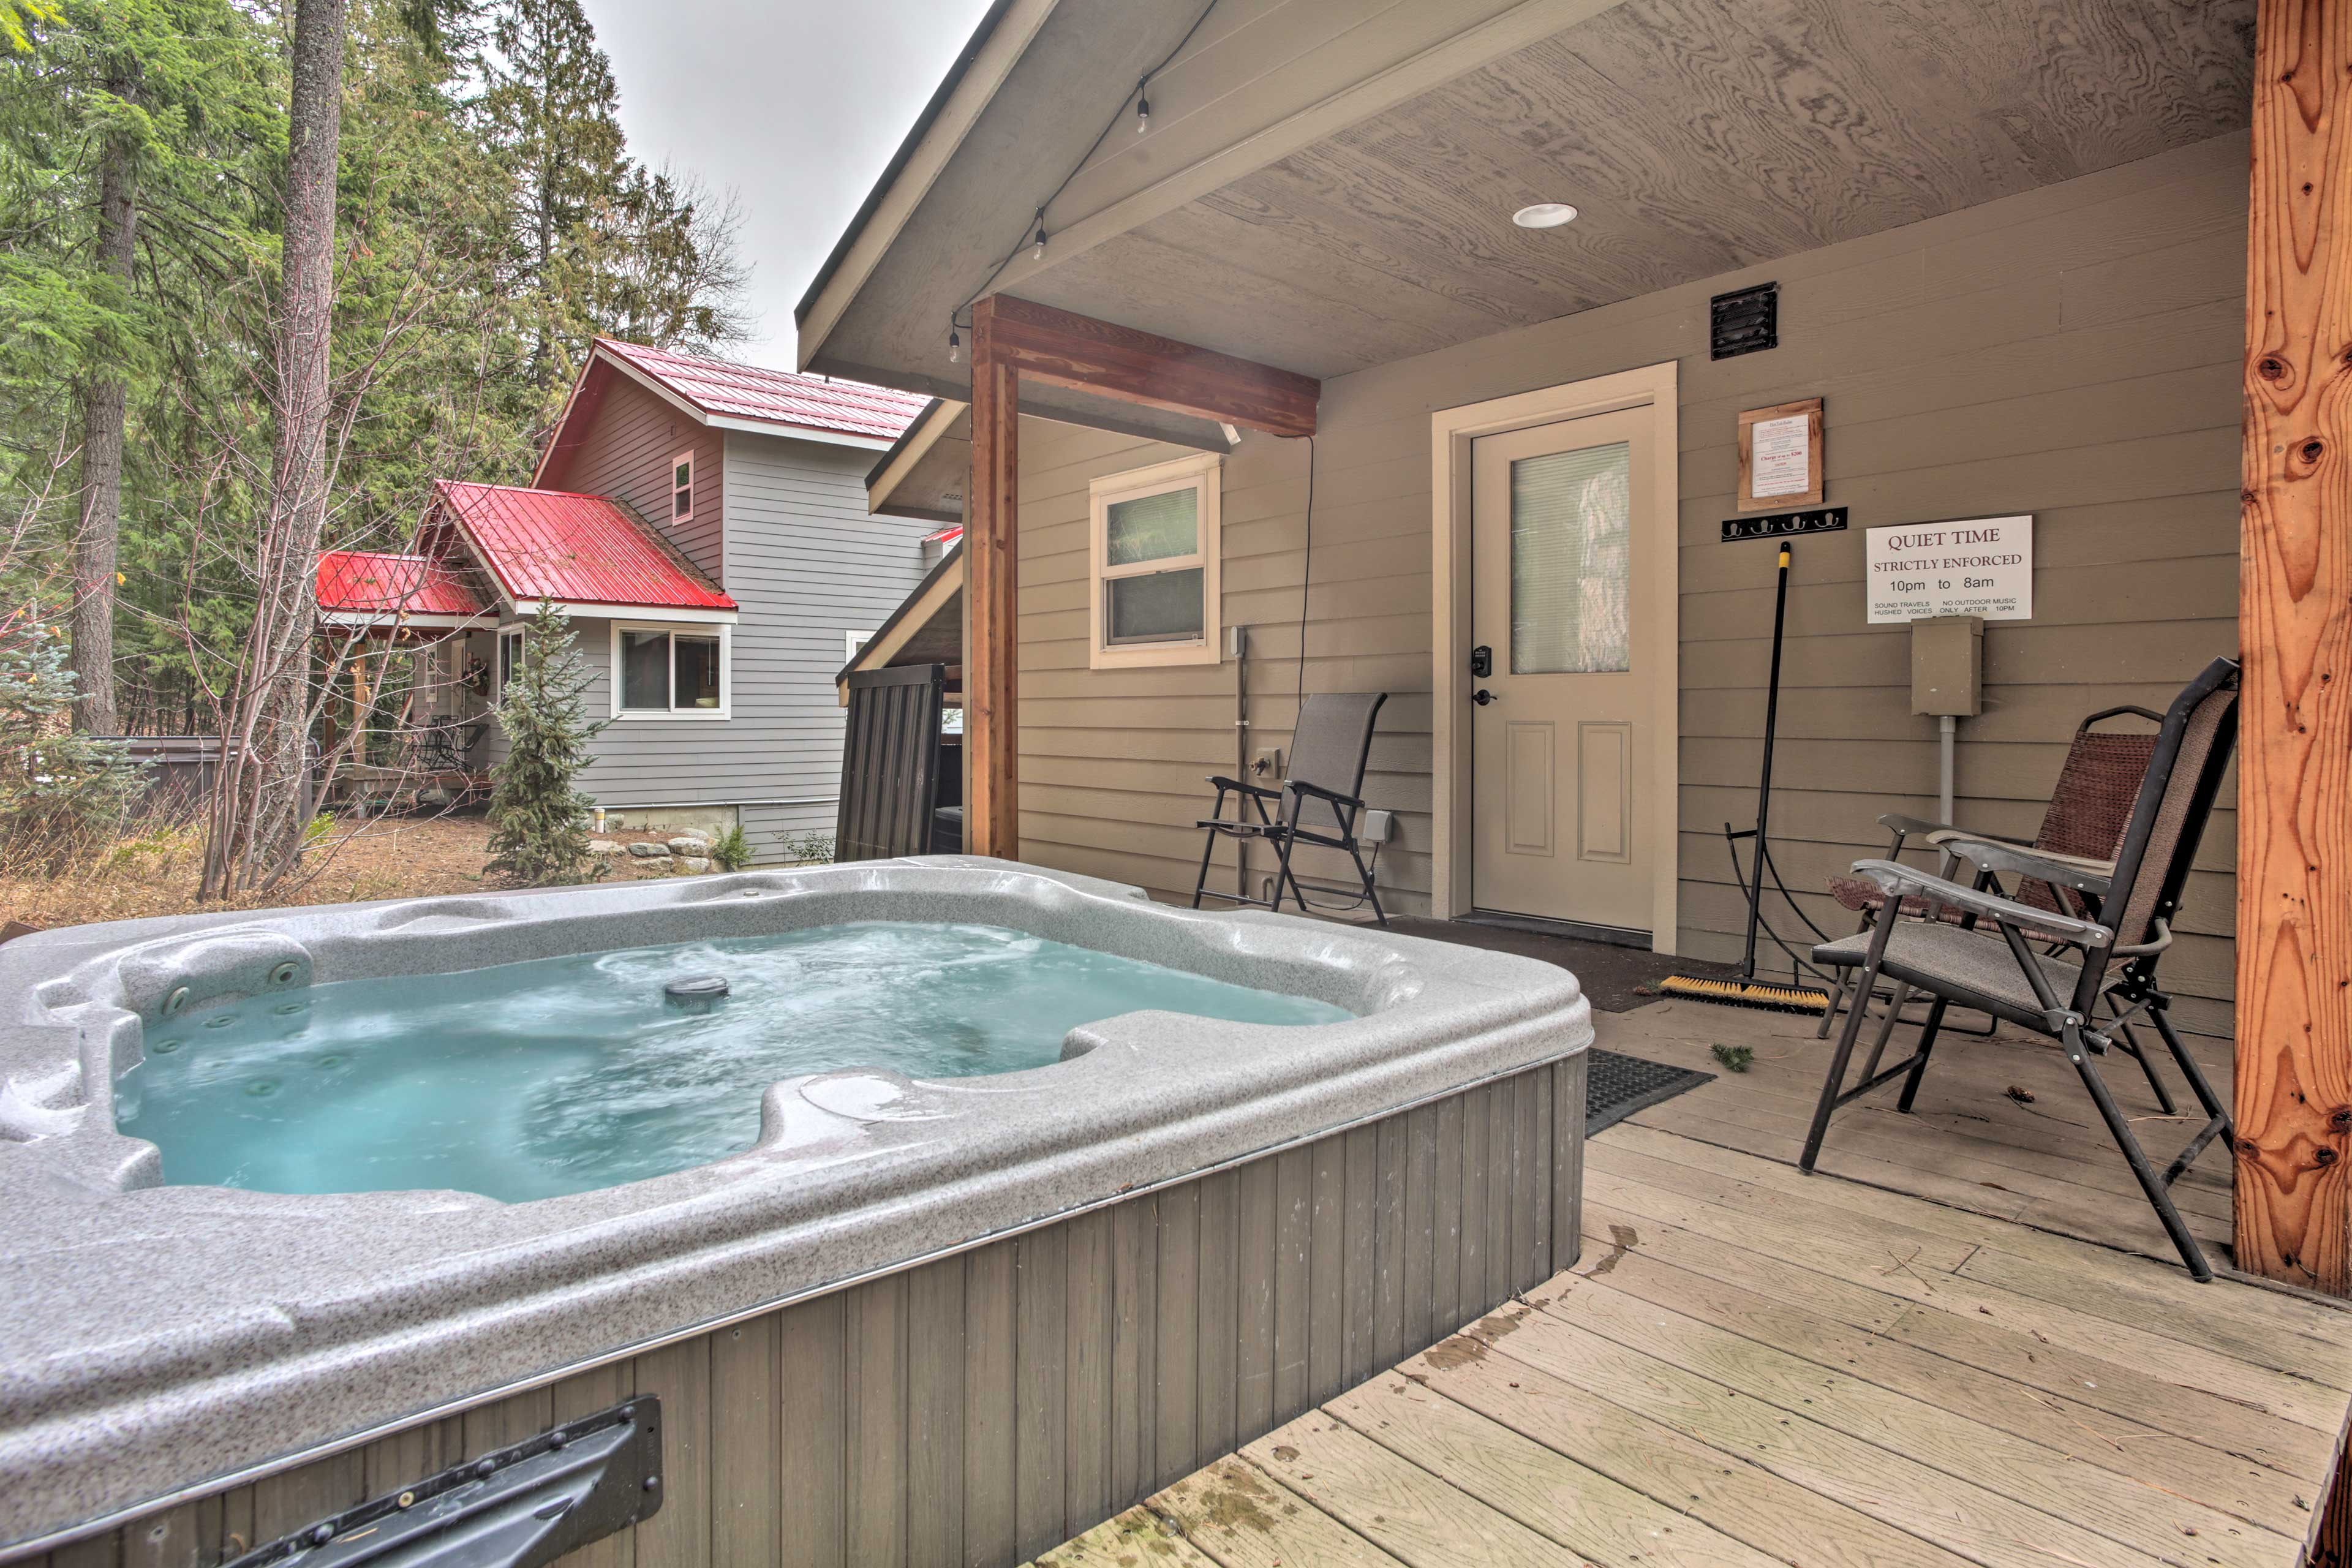 Soak your sore legs in the hot tub.